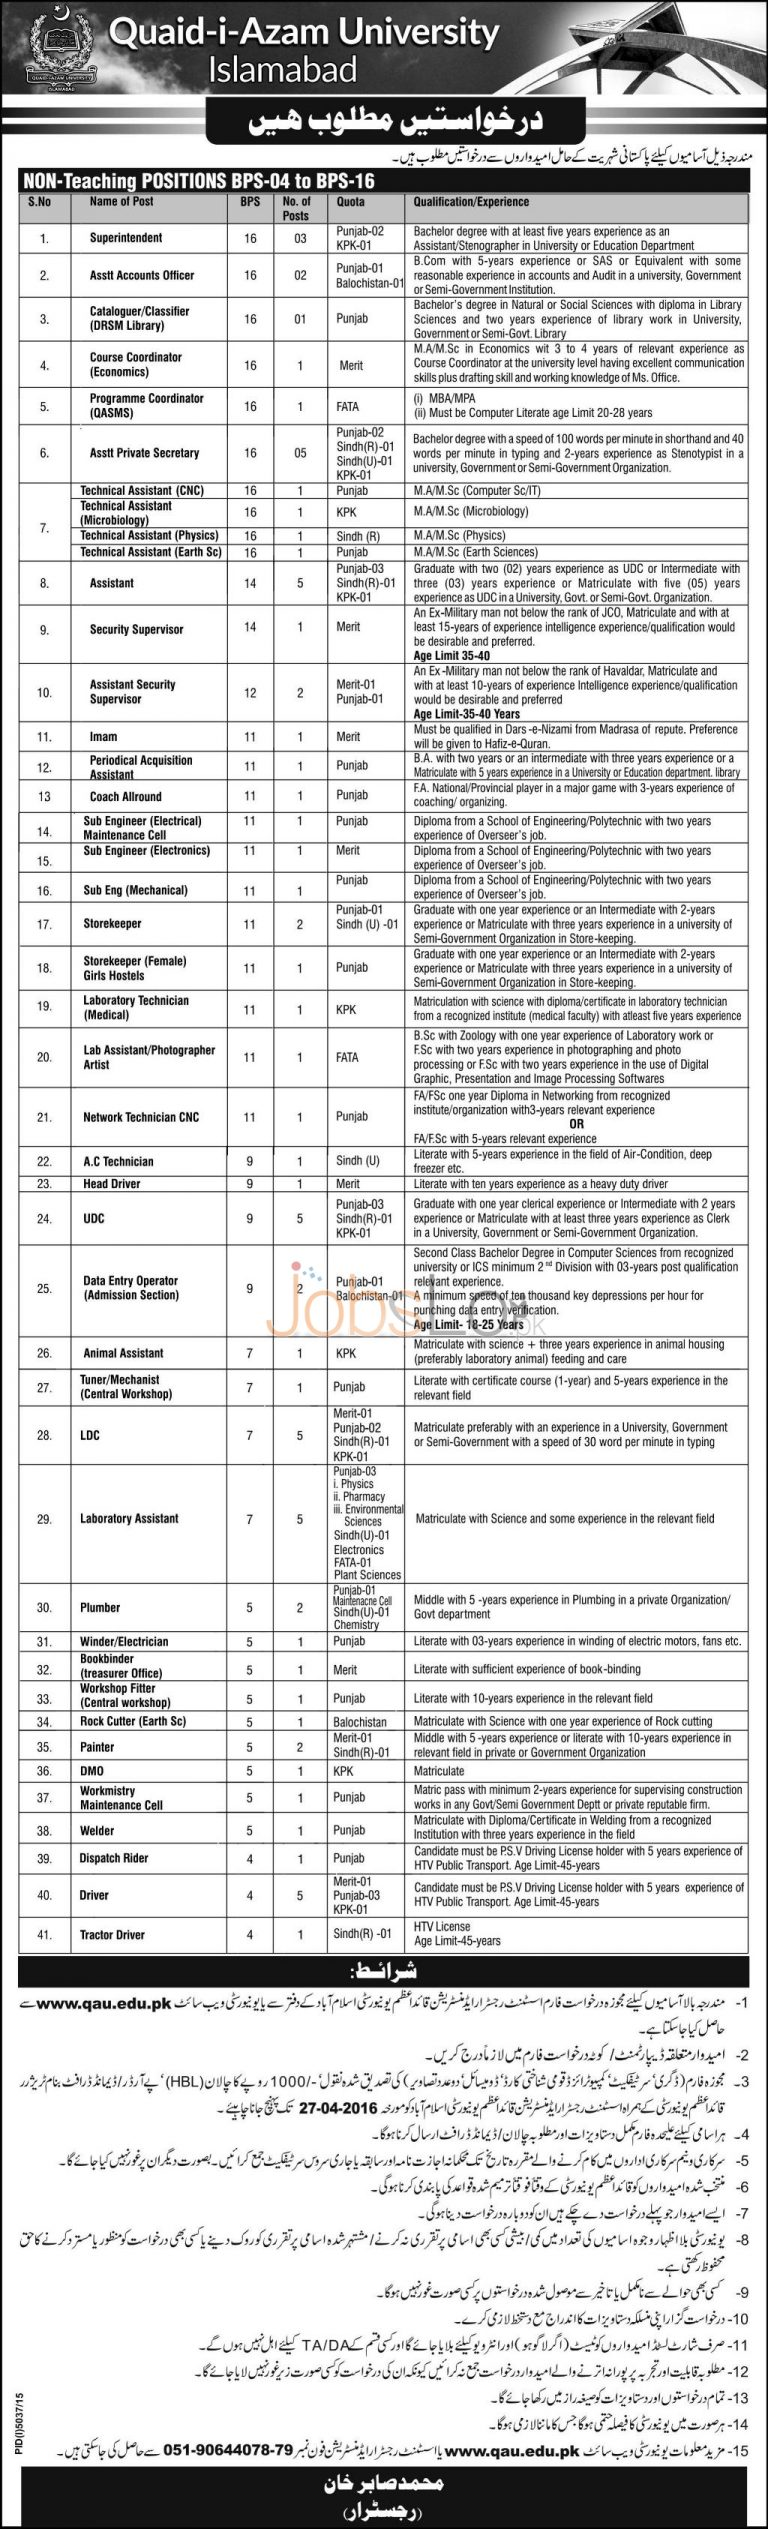 Quaid-e- Azam University Islamabad 2016 Application Form www.qau.edu.pk